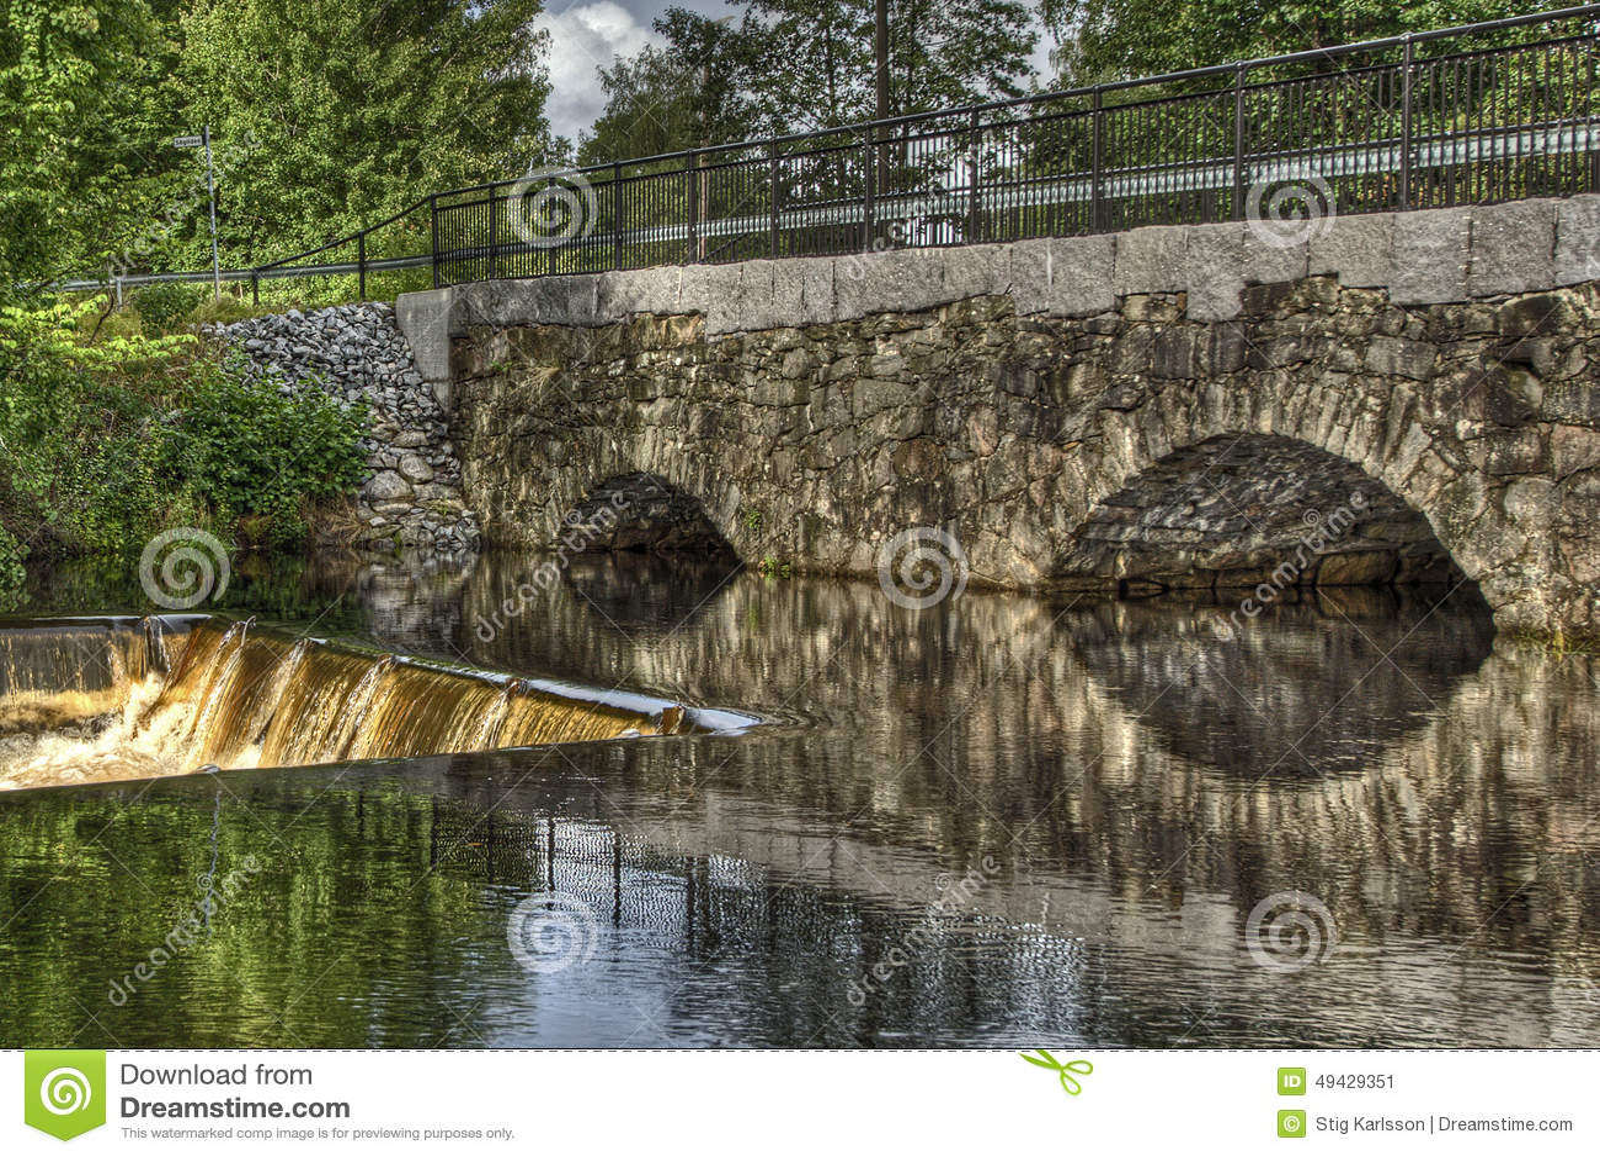 hdr old bridge and - photo #38